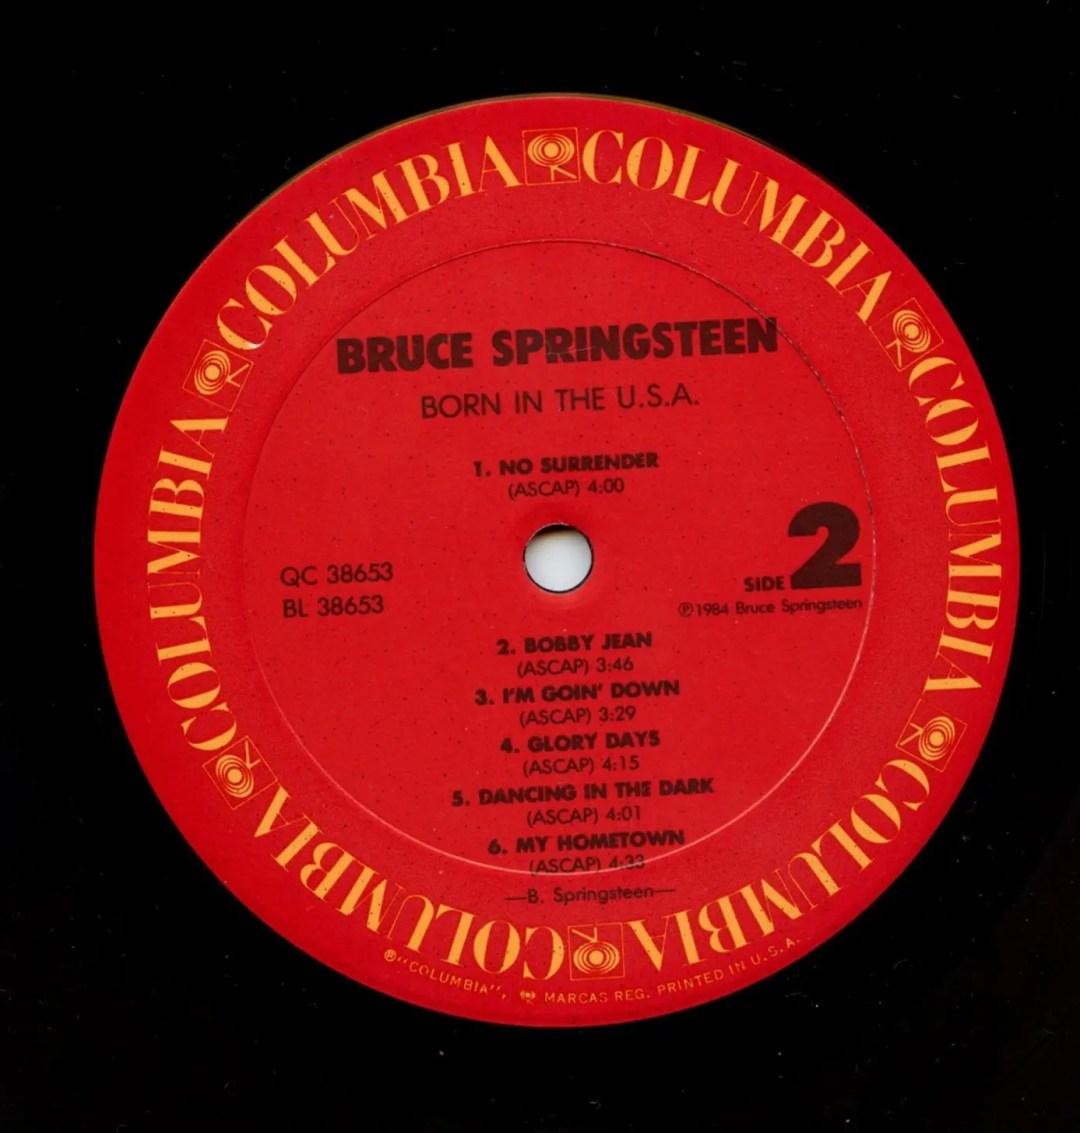 Bruce Springsteen Vinyl Born In The U.S.A. 1984